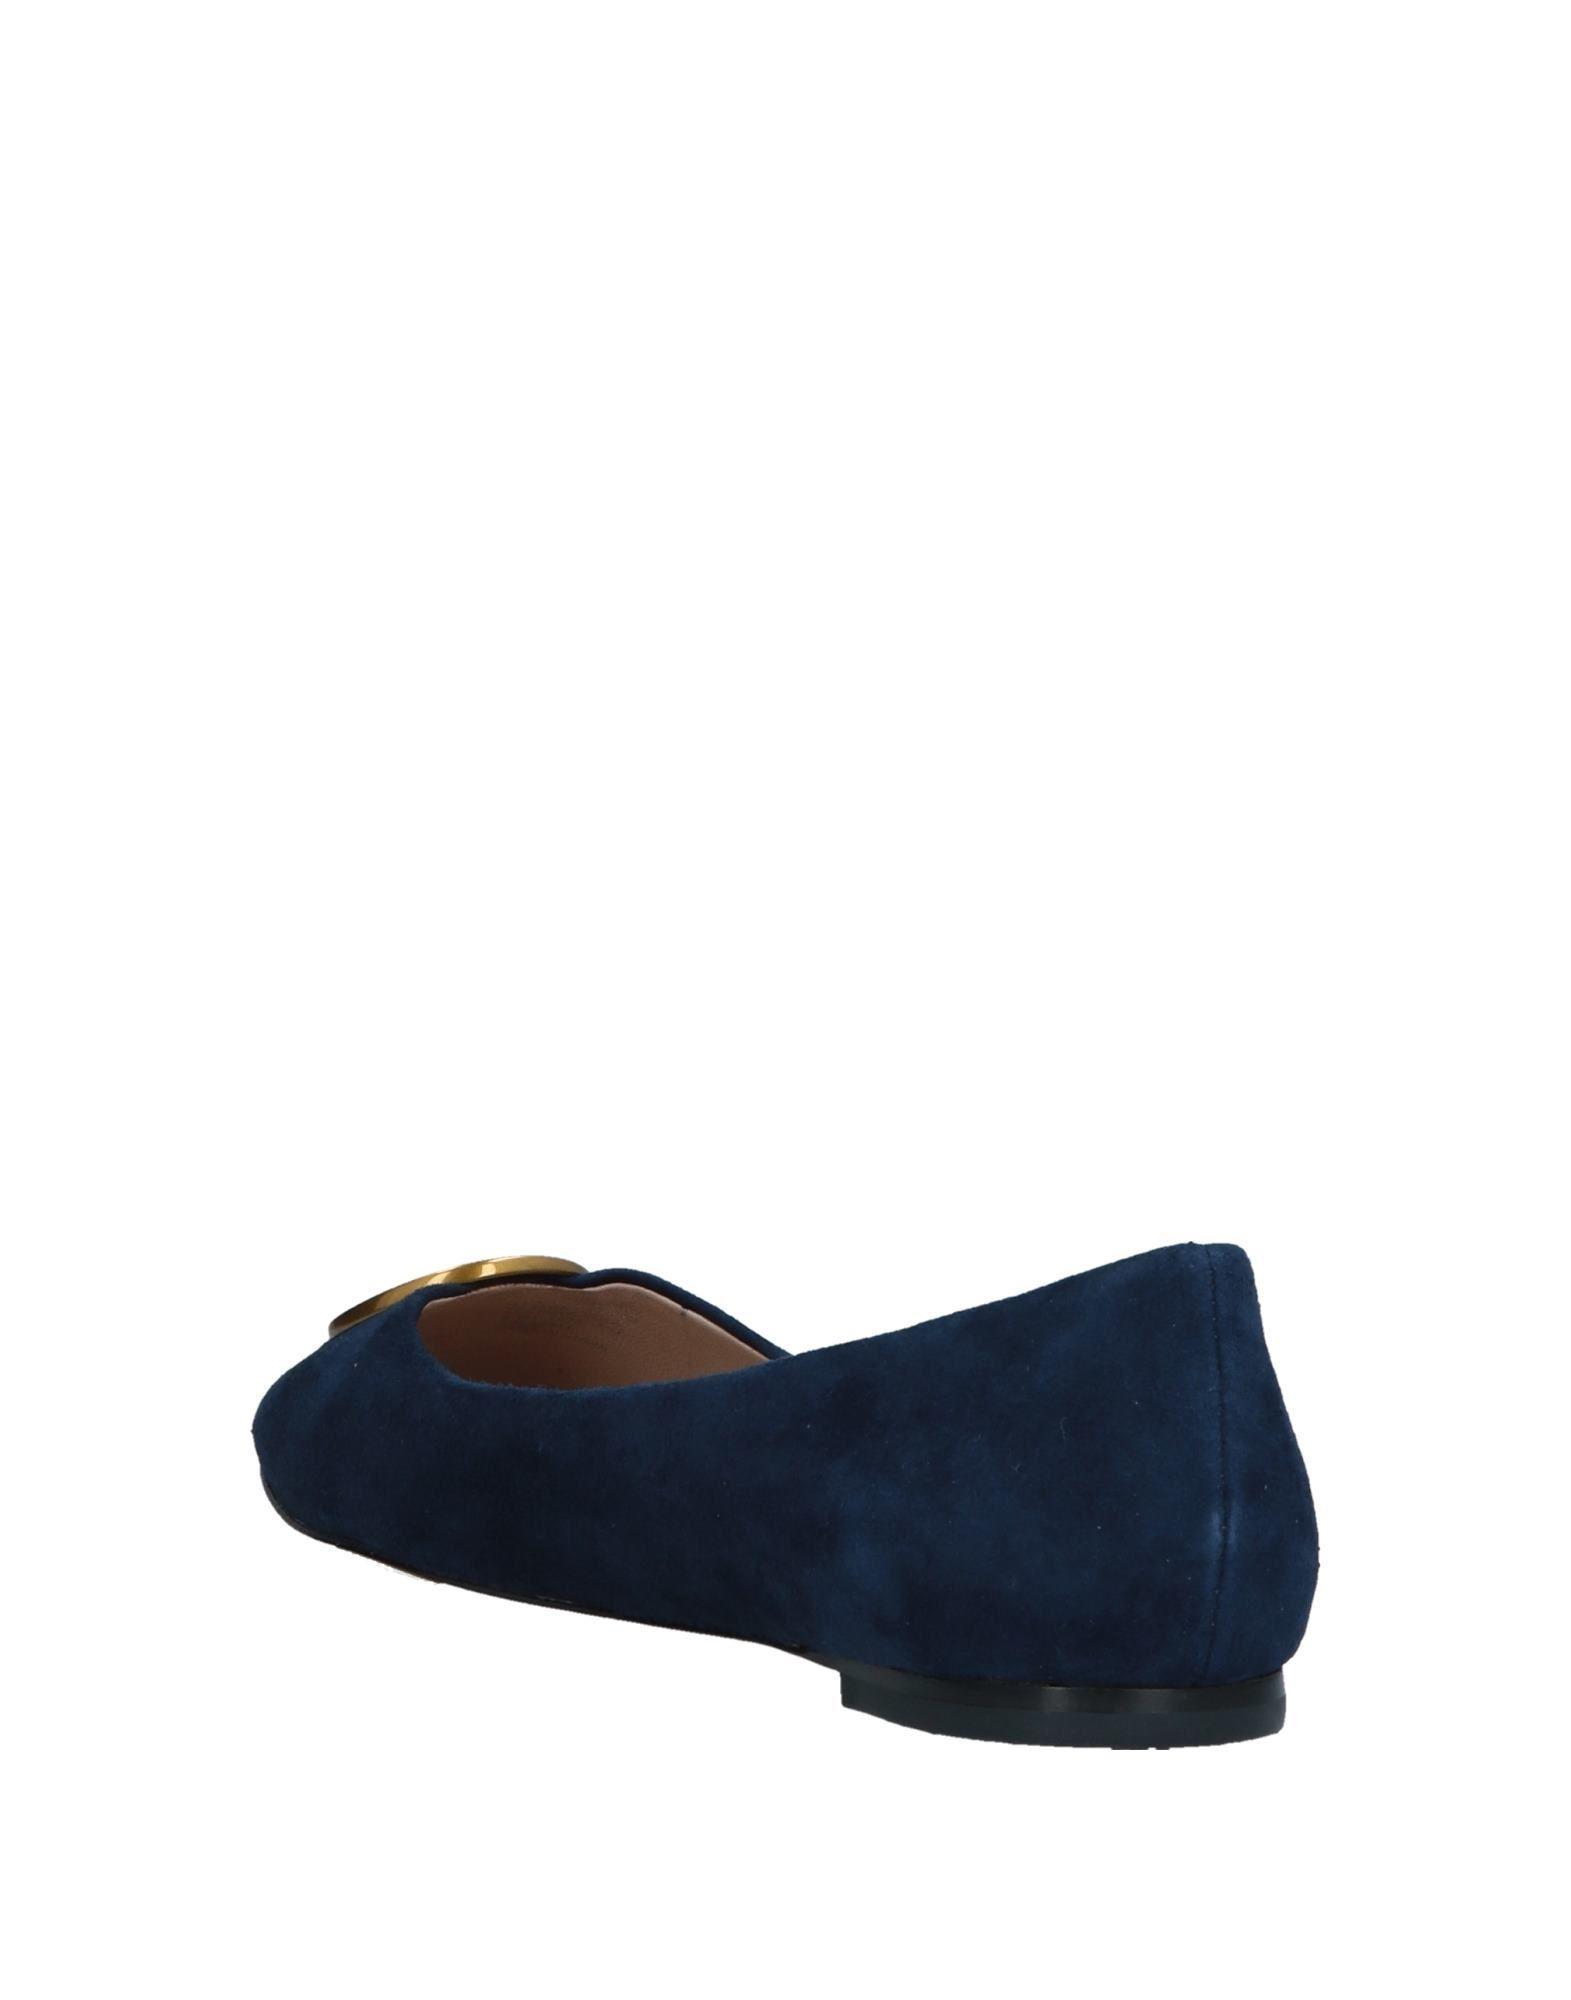 1fde8060c61 Lyst - Tory Burch Ballet Flats in Blue